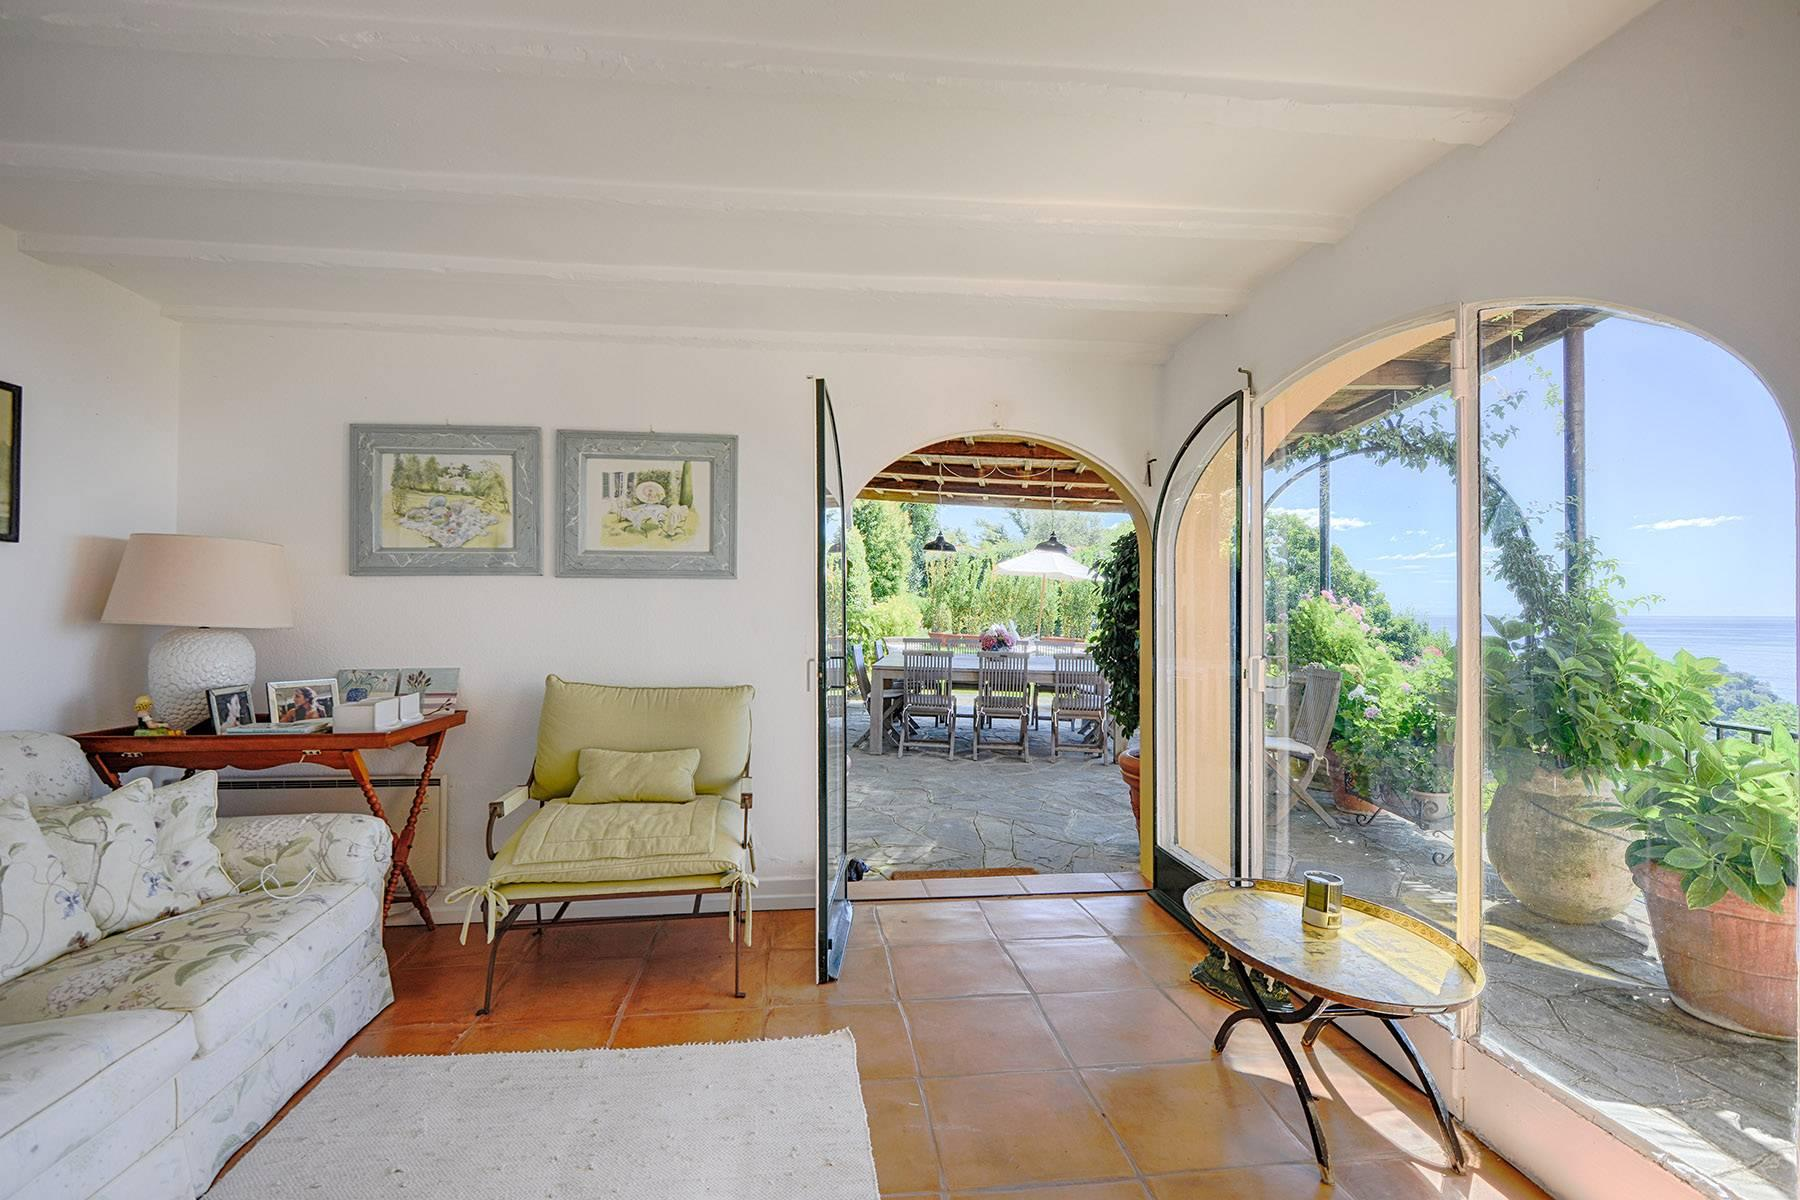 Exclusive property on the sea of Portofino - 24